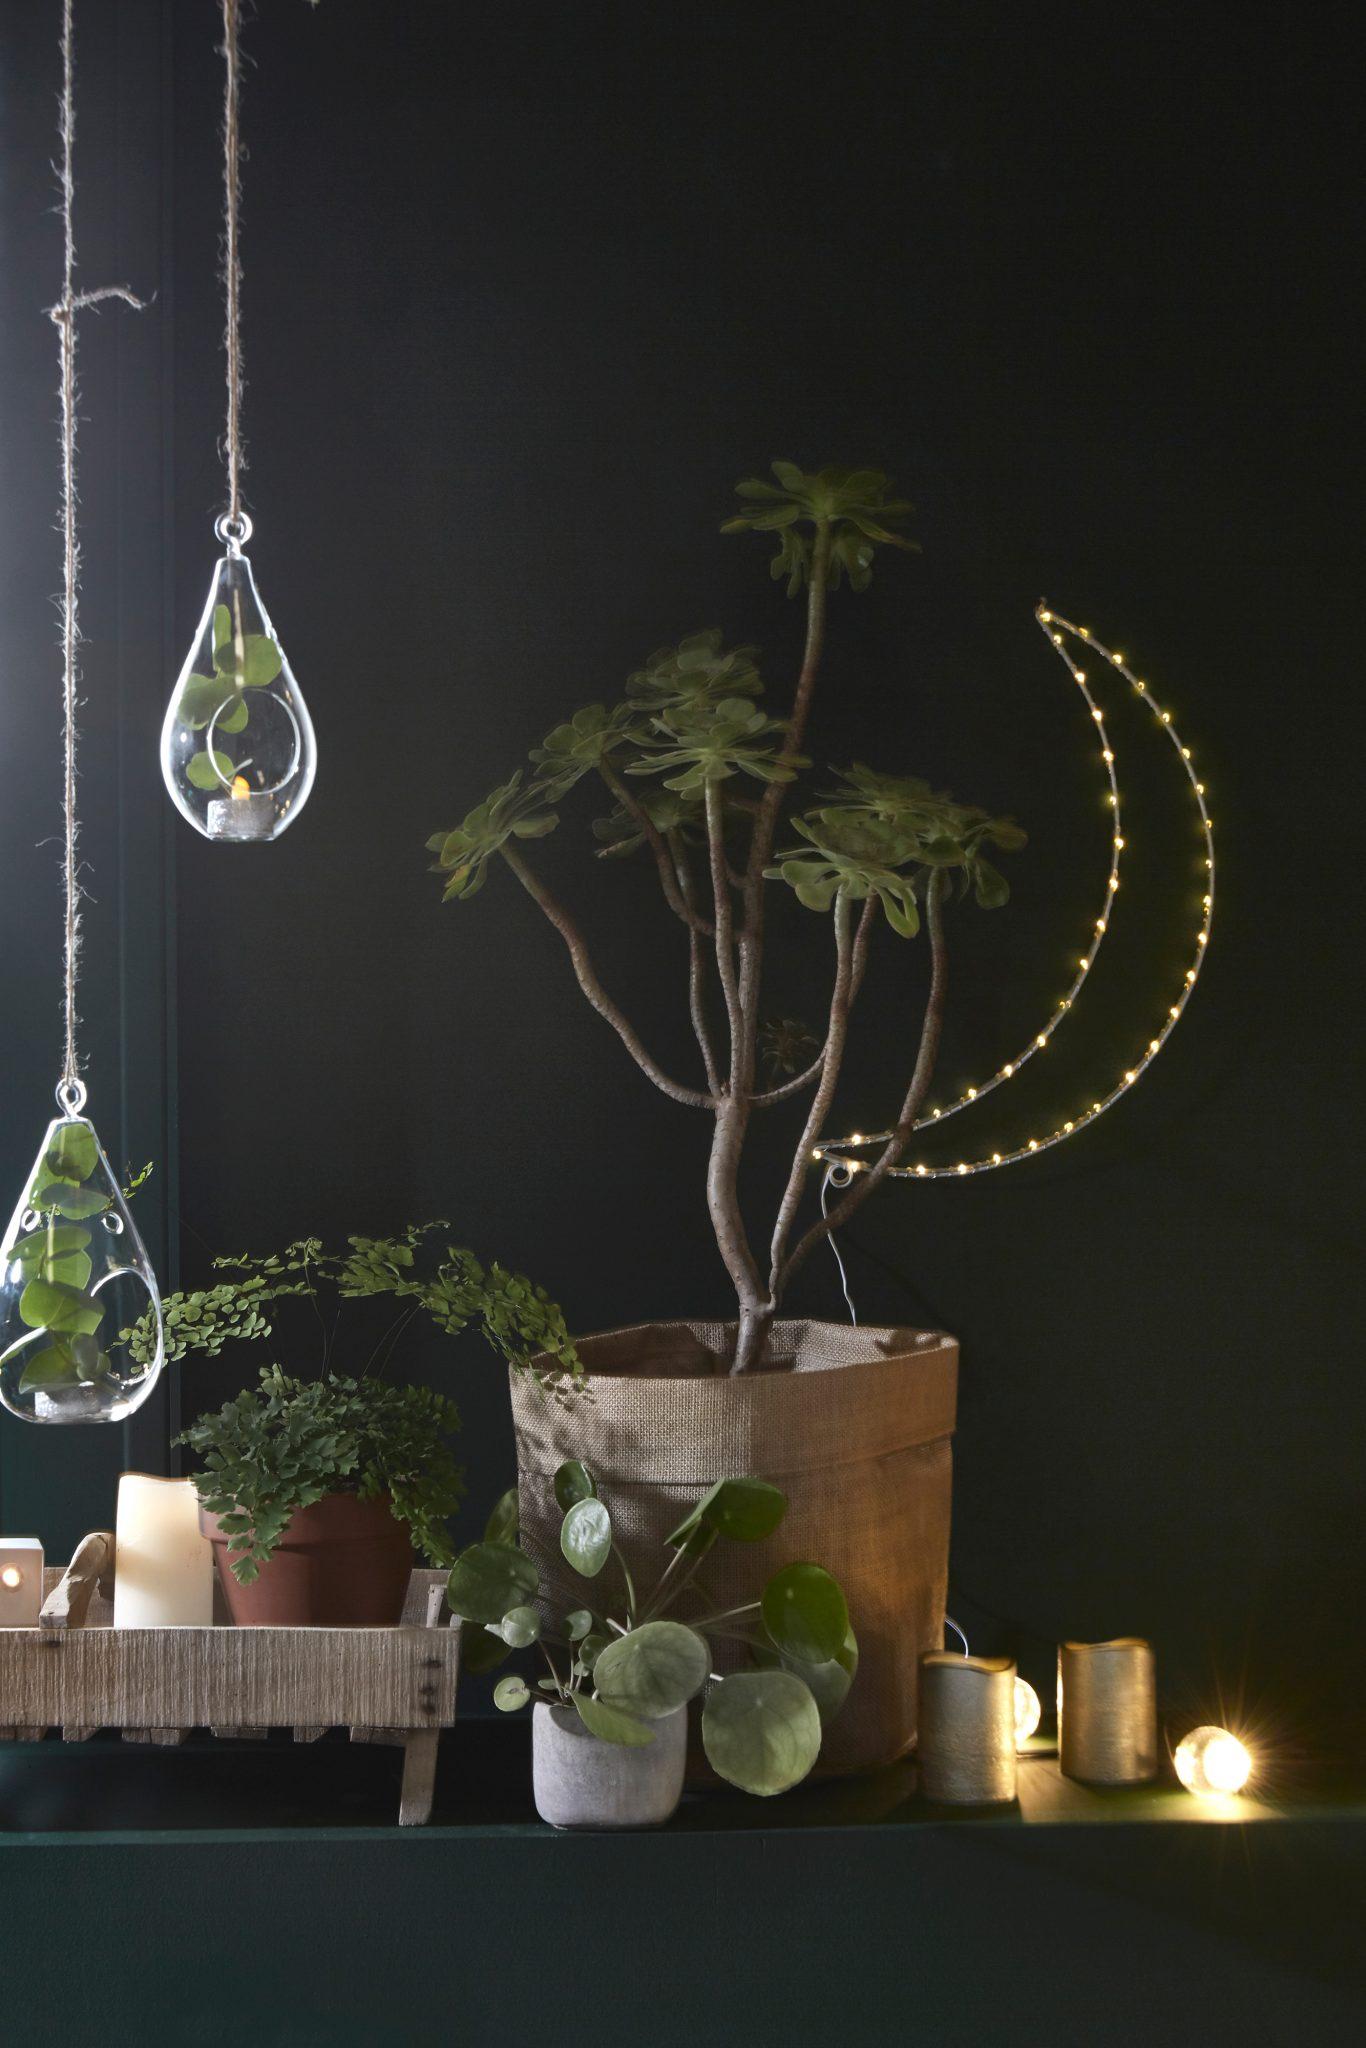 decoration noel vert lune plantes tendance 2018 2017